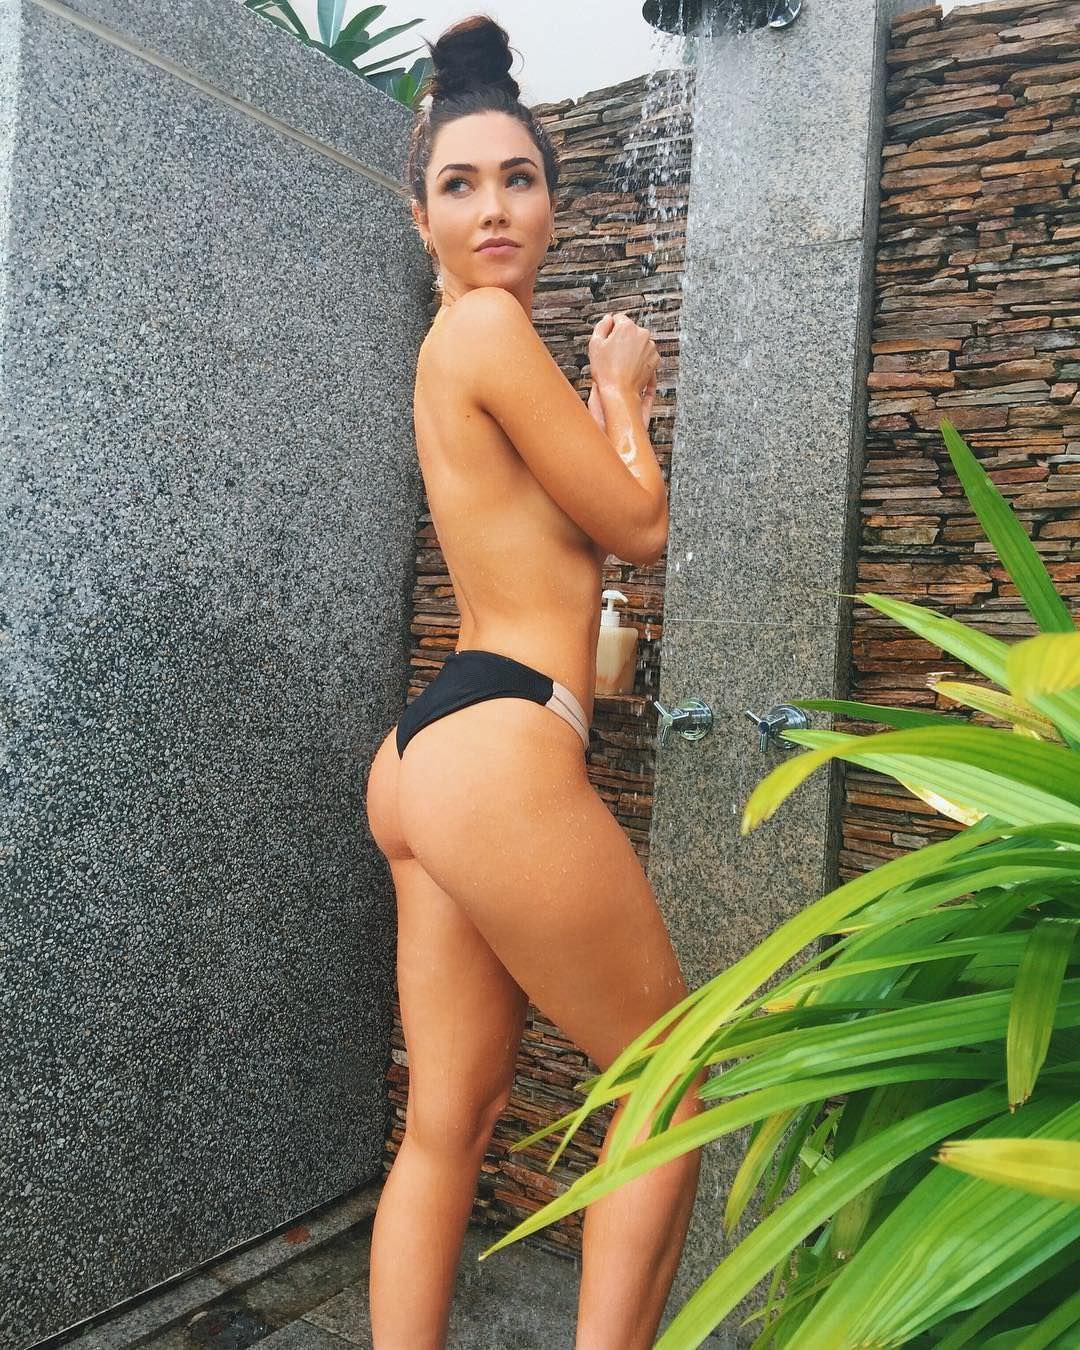 Джессика Грин фото в бикини